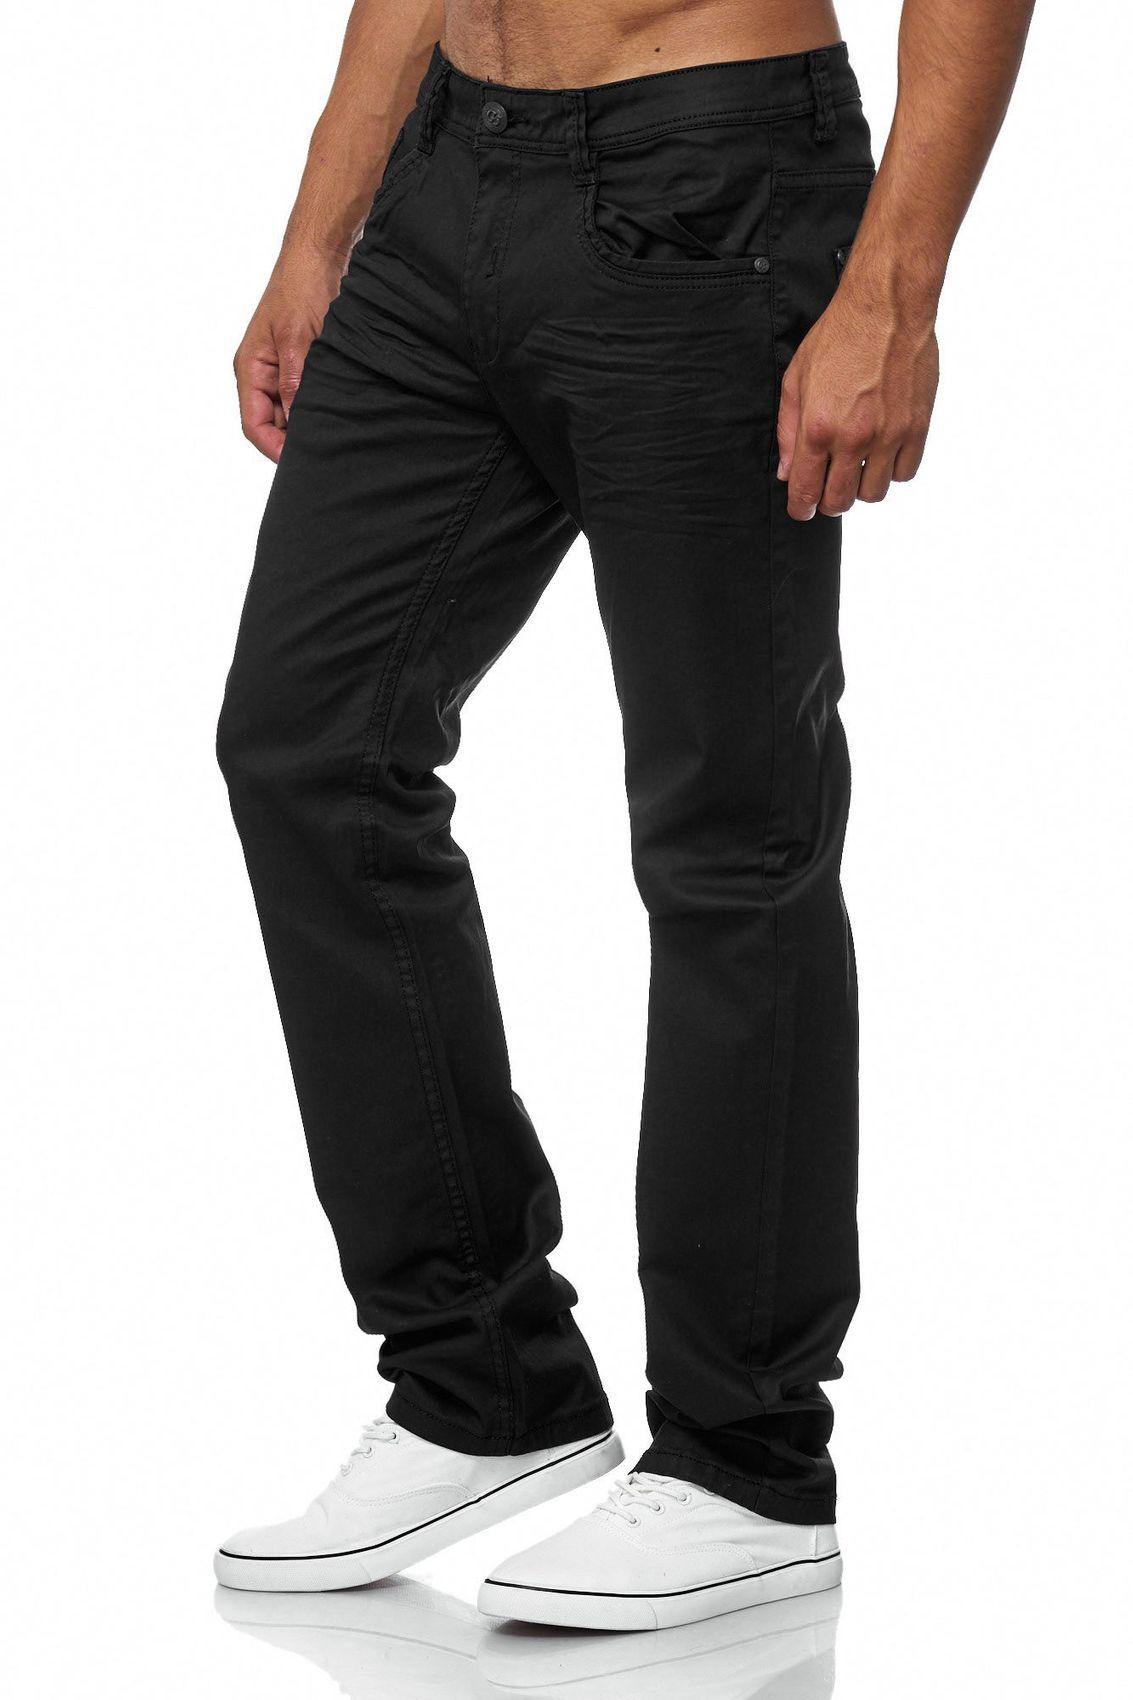 herren hose beschichtet schwarz tapered jeans coated regular fit big size wow ebay. Black Bedroom Furniture Sets. Home Design Ideas